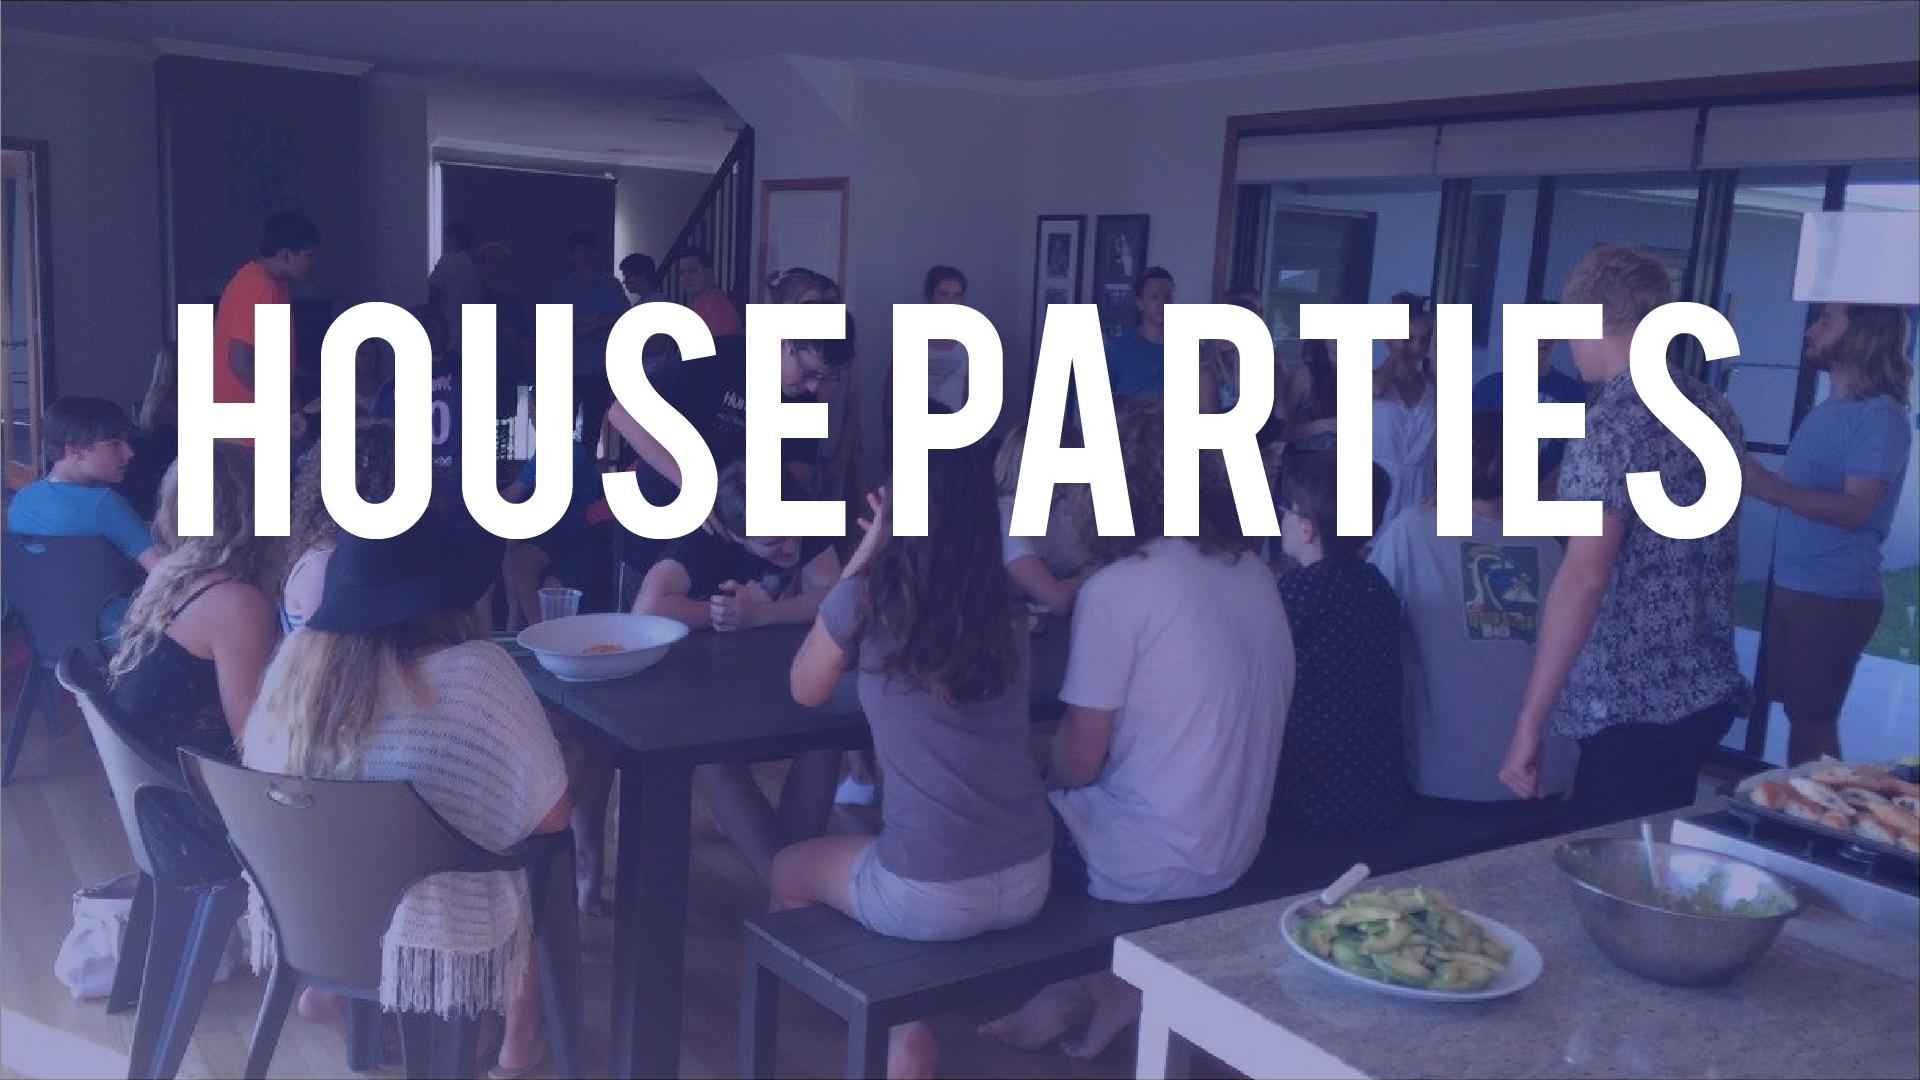 House Parties   Apr 13 7-9's: Nowicki's  10-12's: Shield's